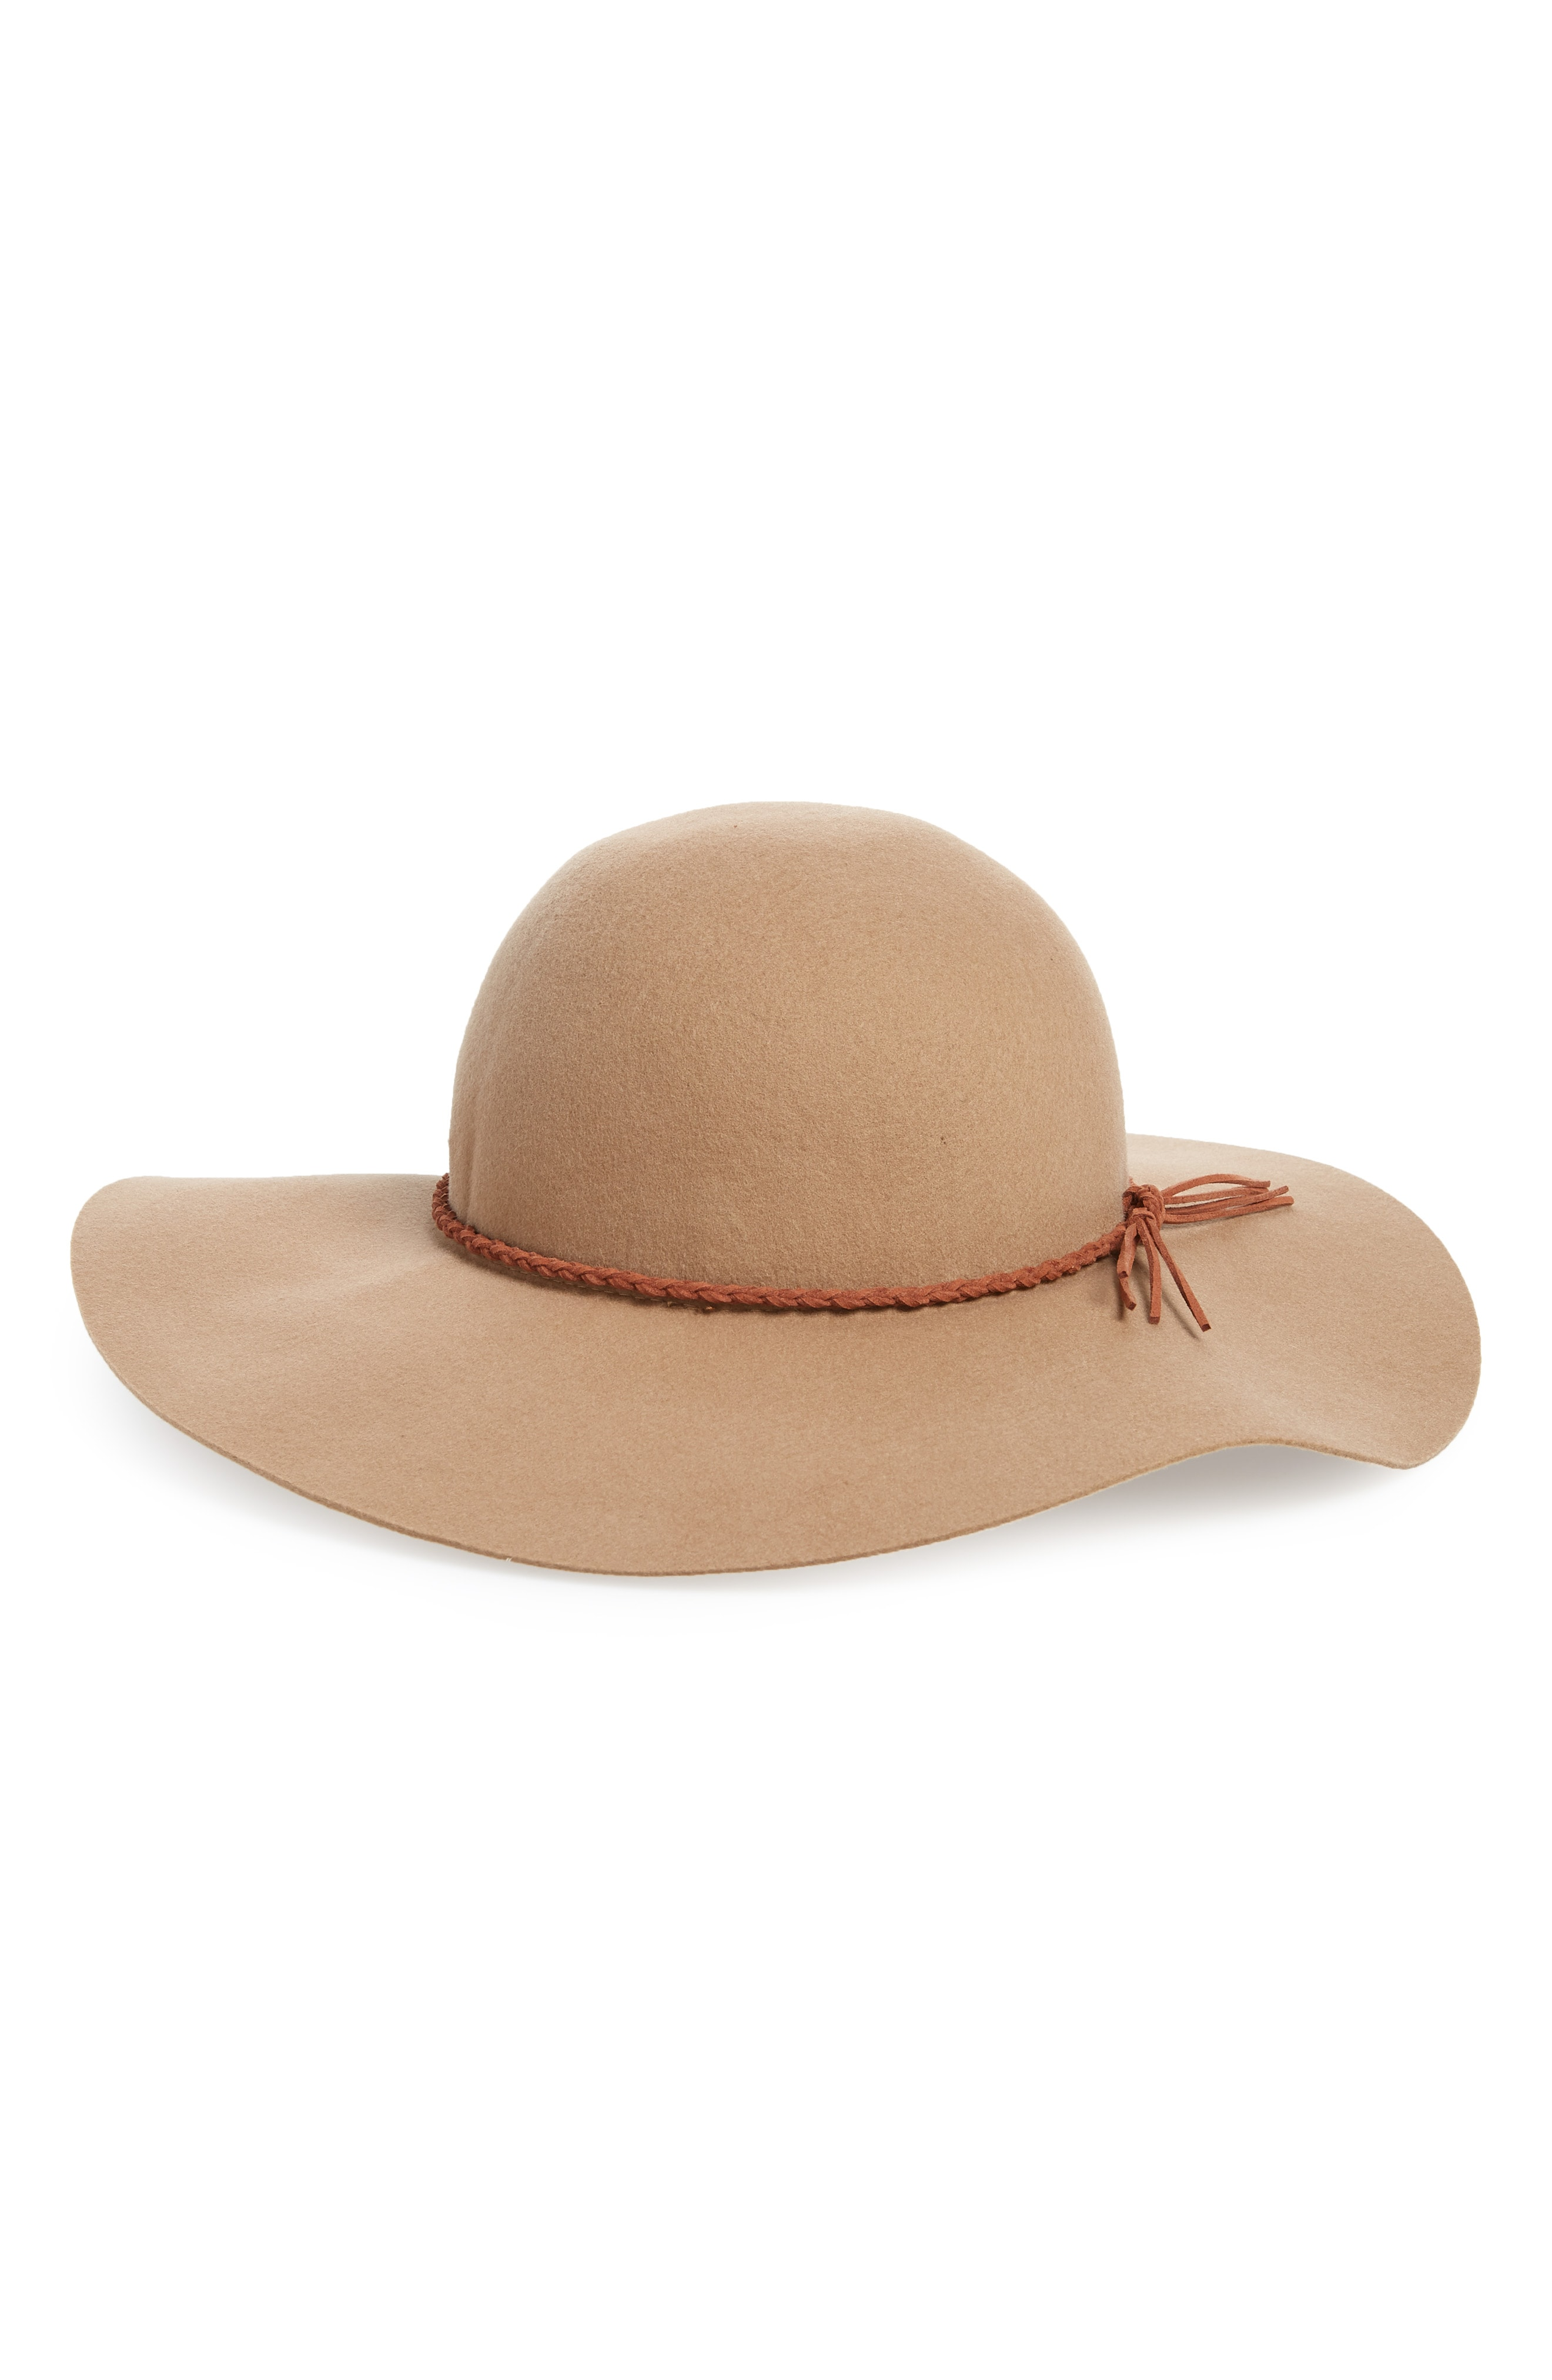 David & Young Faux Leather Trim Felt Floppy Hat